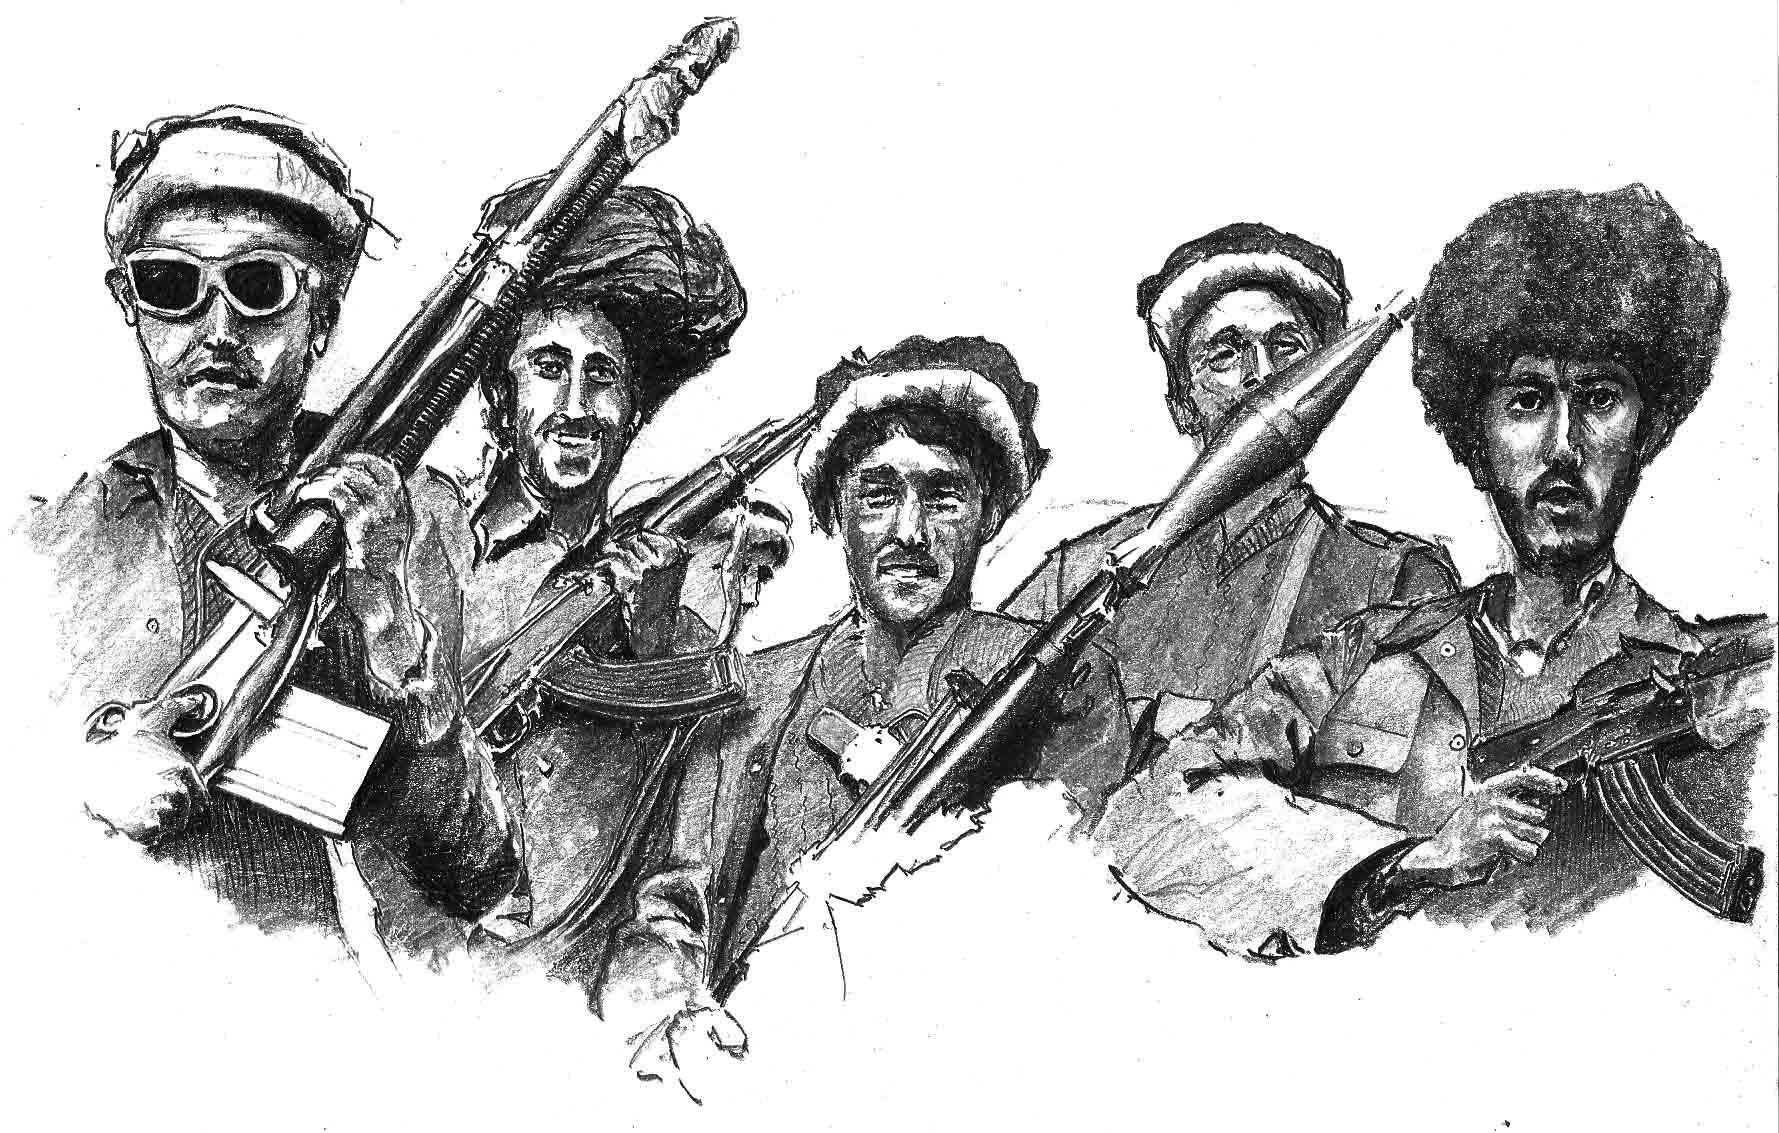 Mujahadeenpencil.jpg